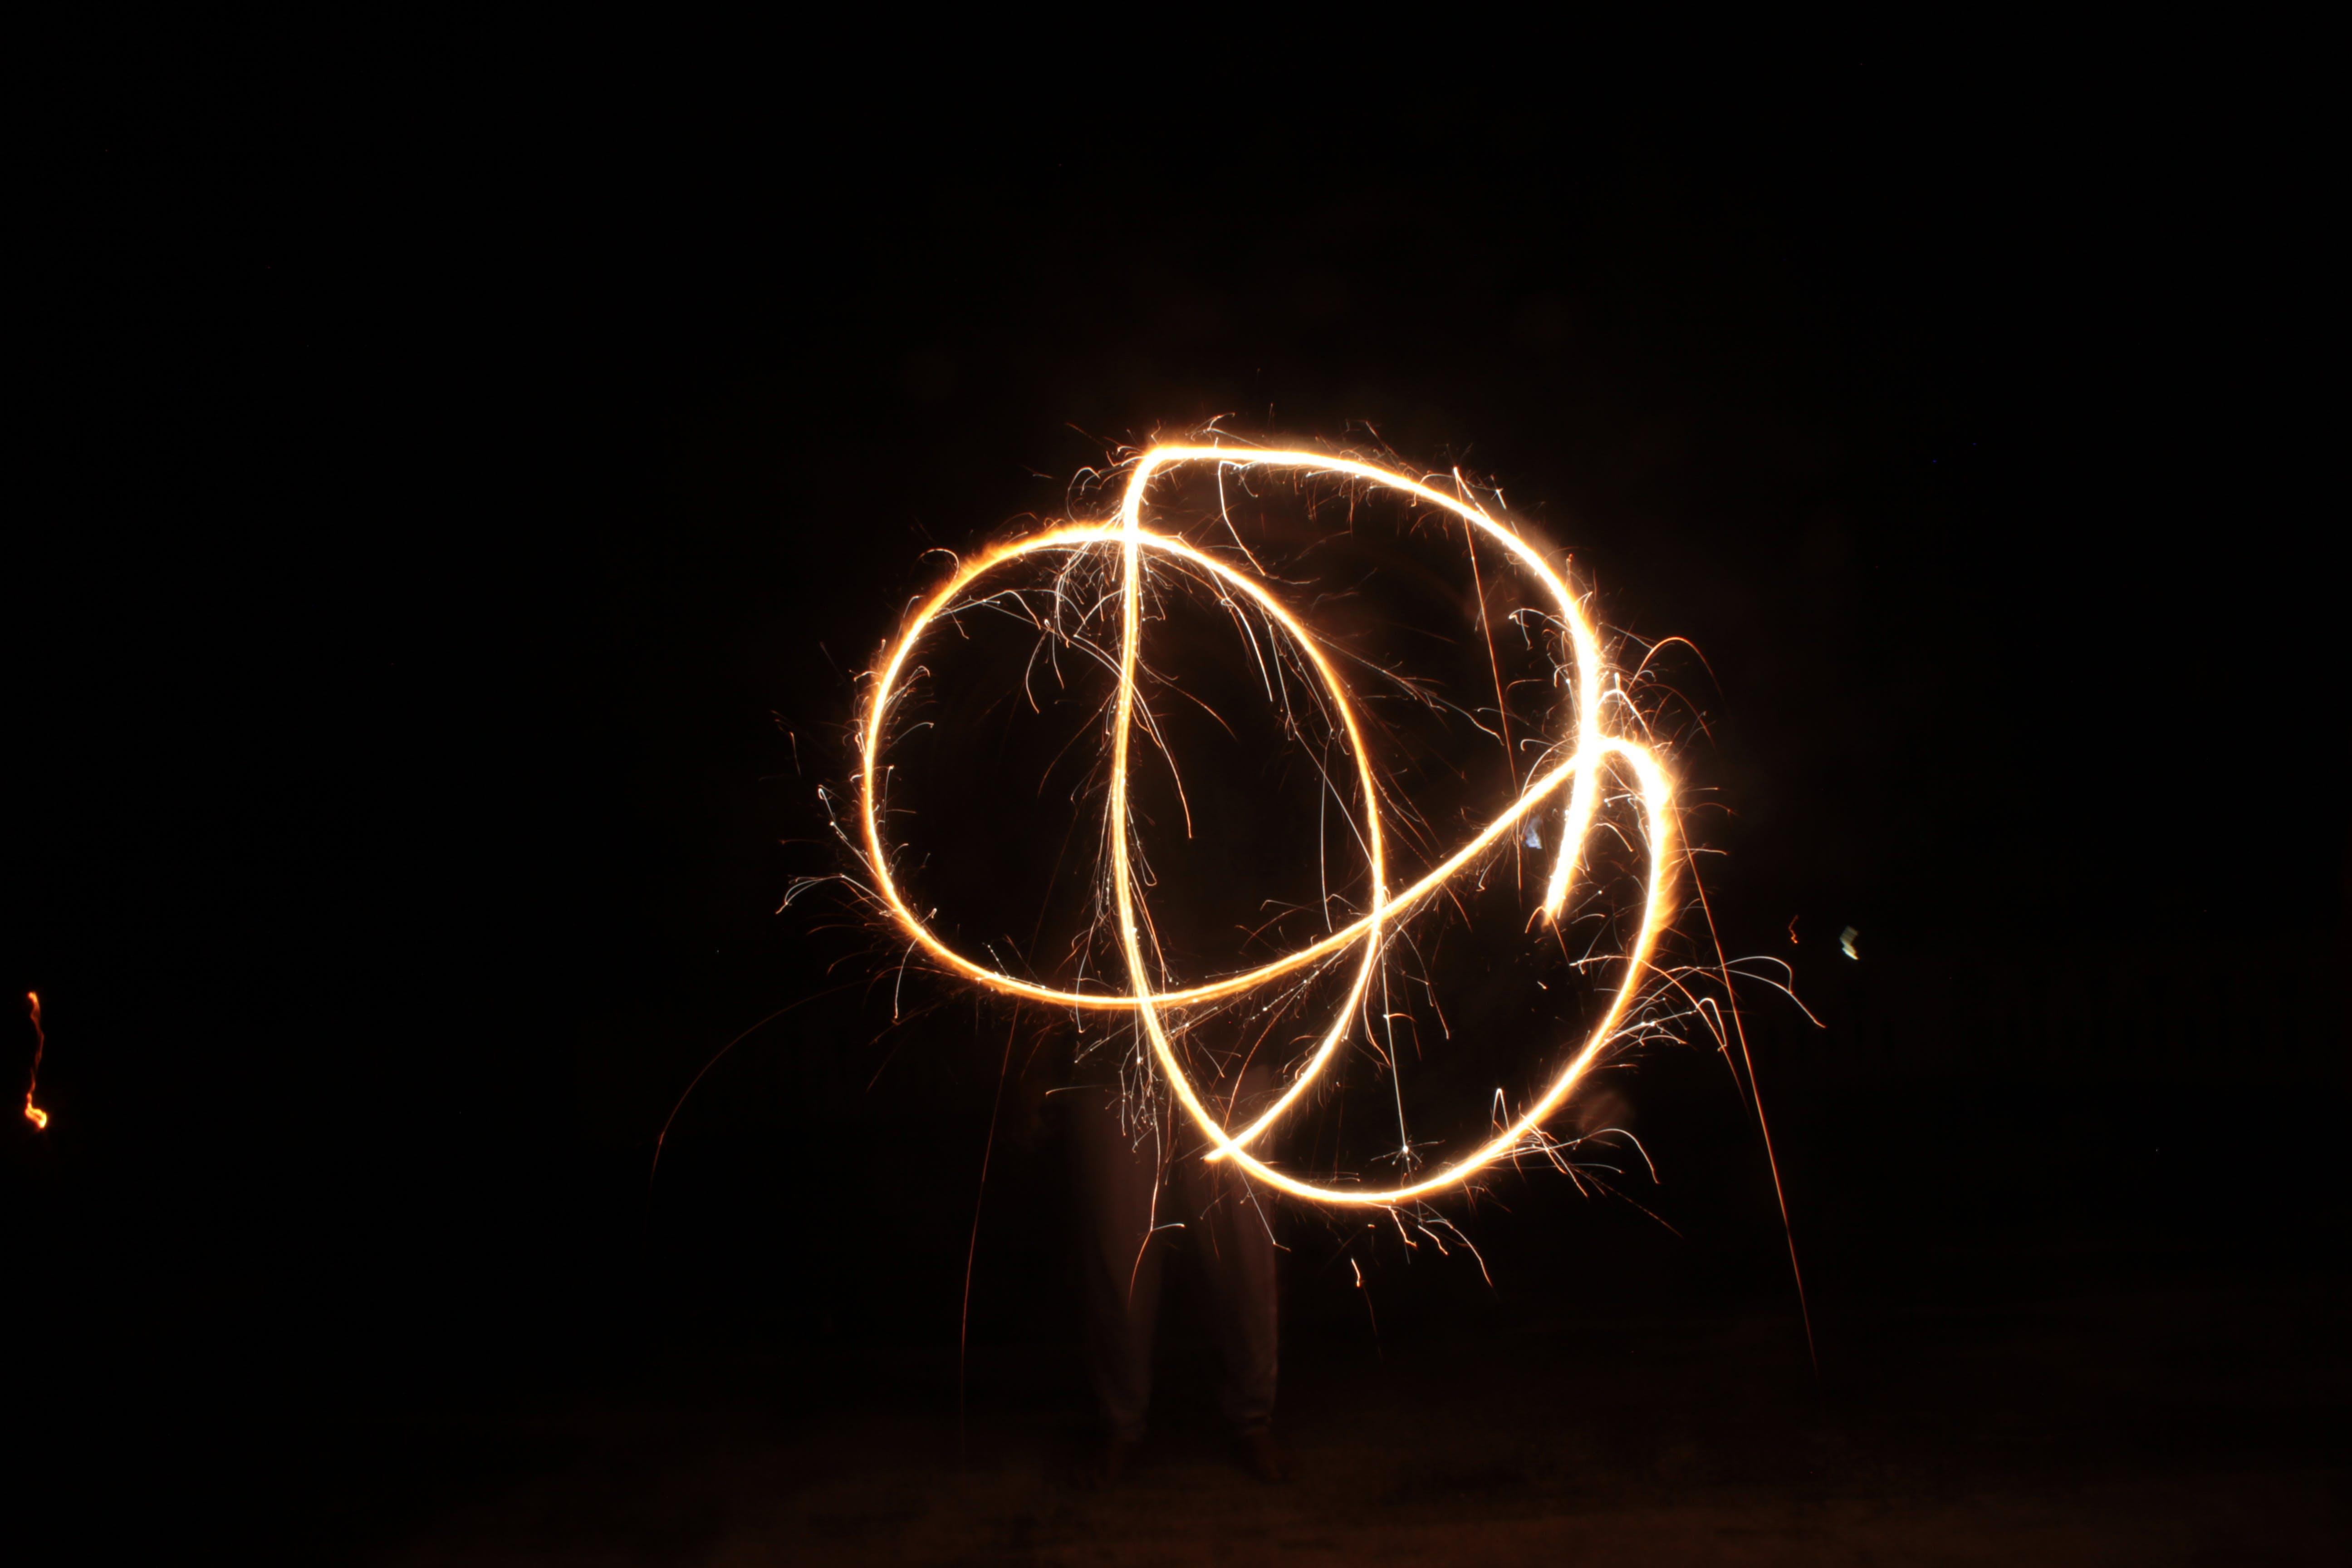 Free stock photo of beautiful, fireworks display, long exposure